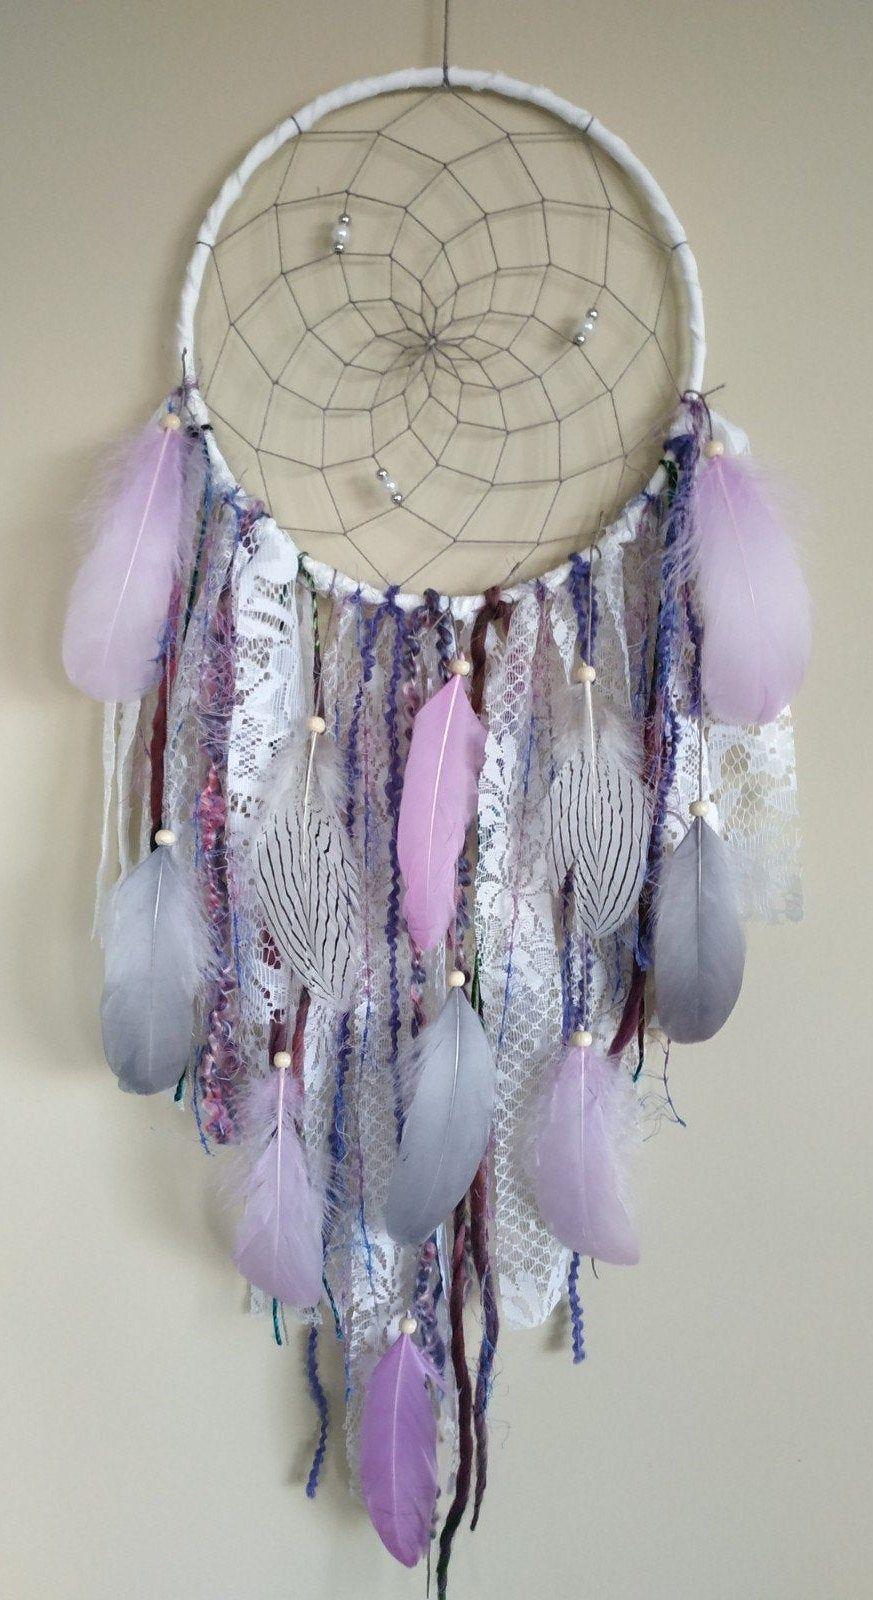 Large Boho Feather Dream Catcher Kit DIY Wall Hanging Dreamcatcher Room Decor